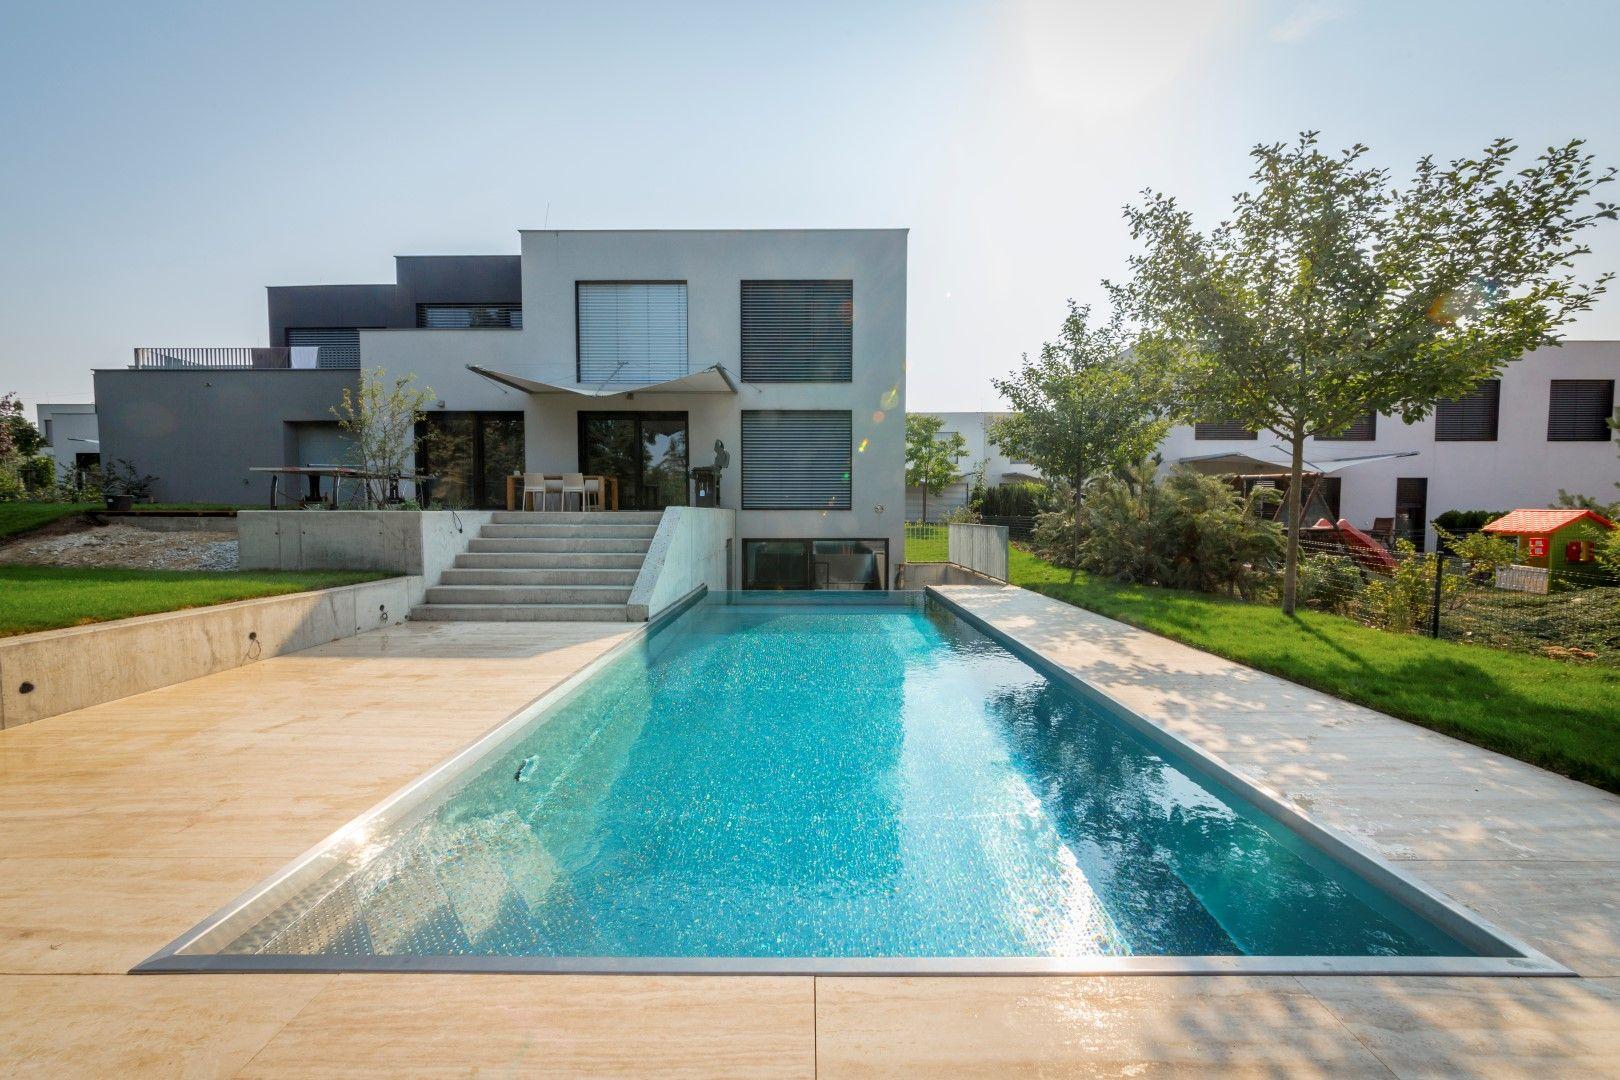 Piscine En Inox Steel And Style luxurious private stainelss steel swimming pool imaginox